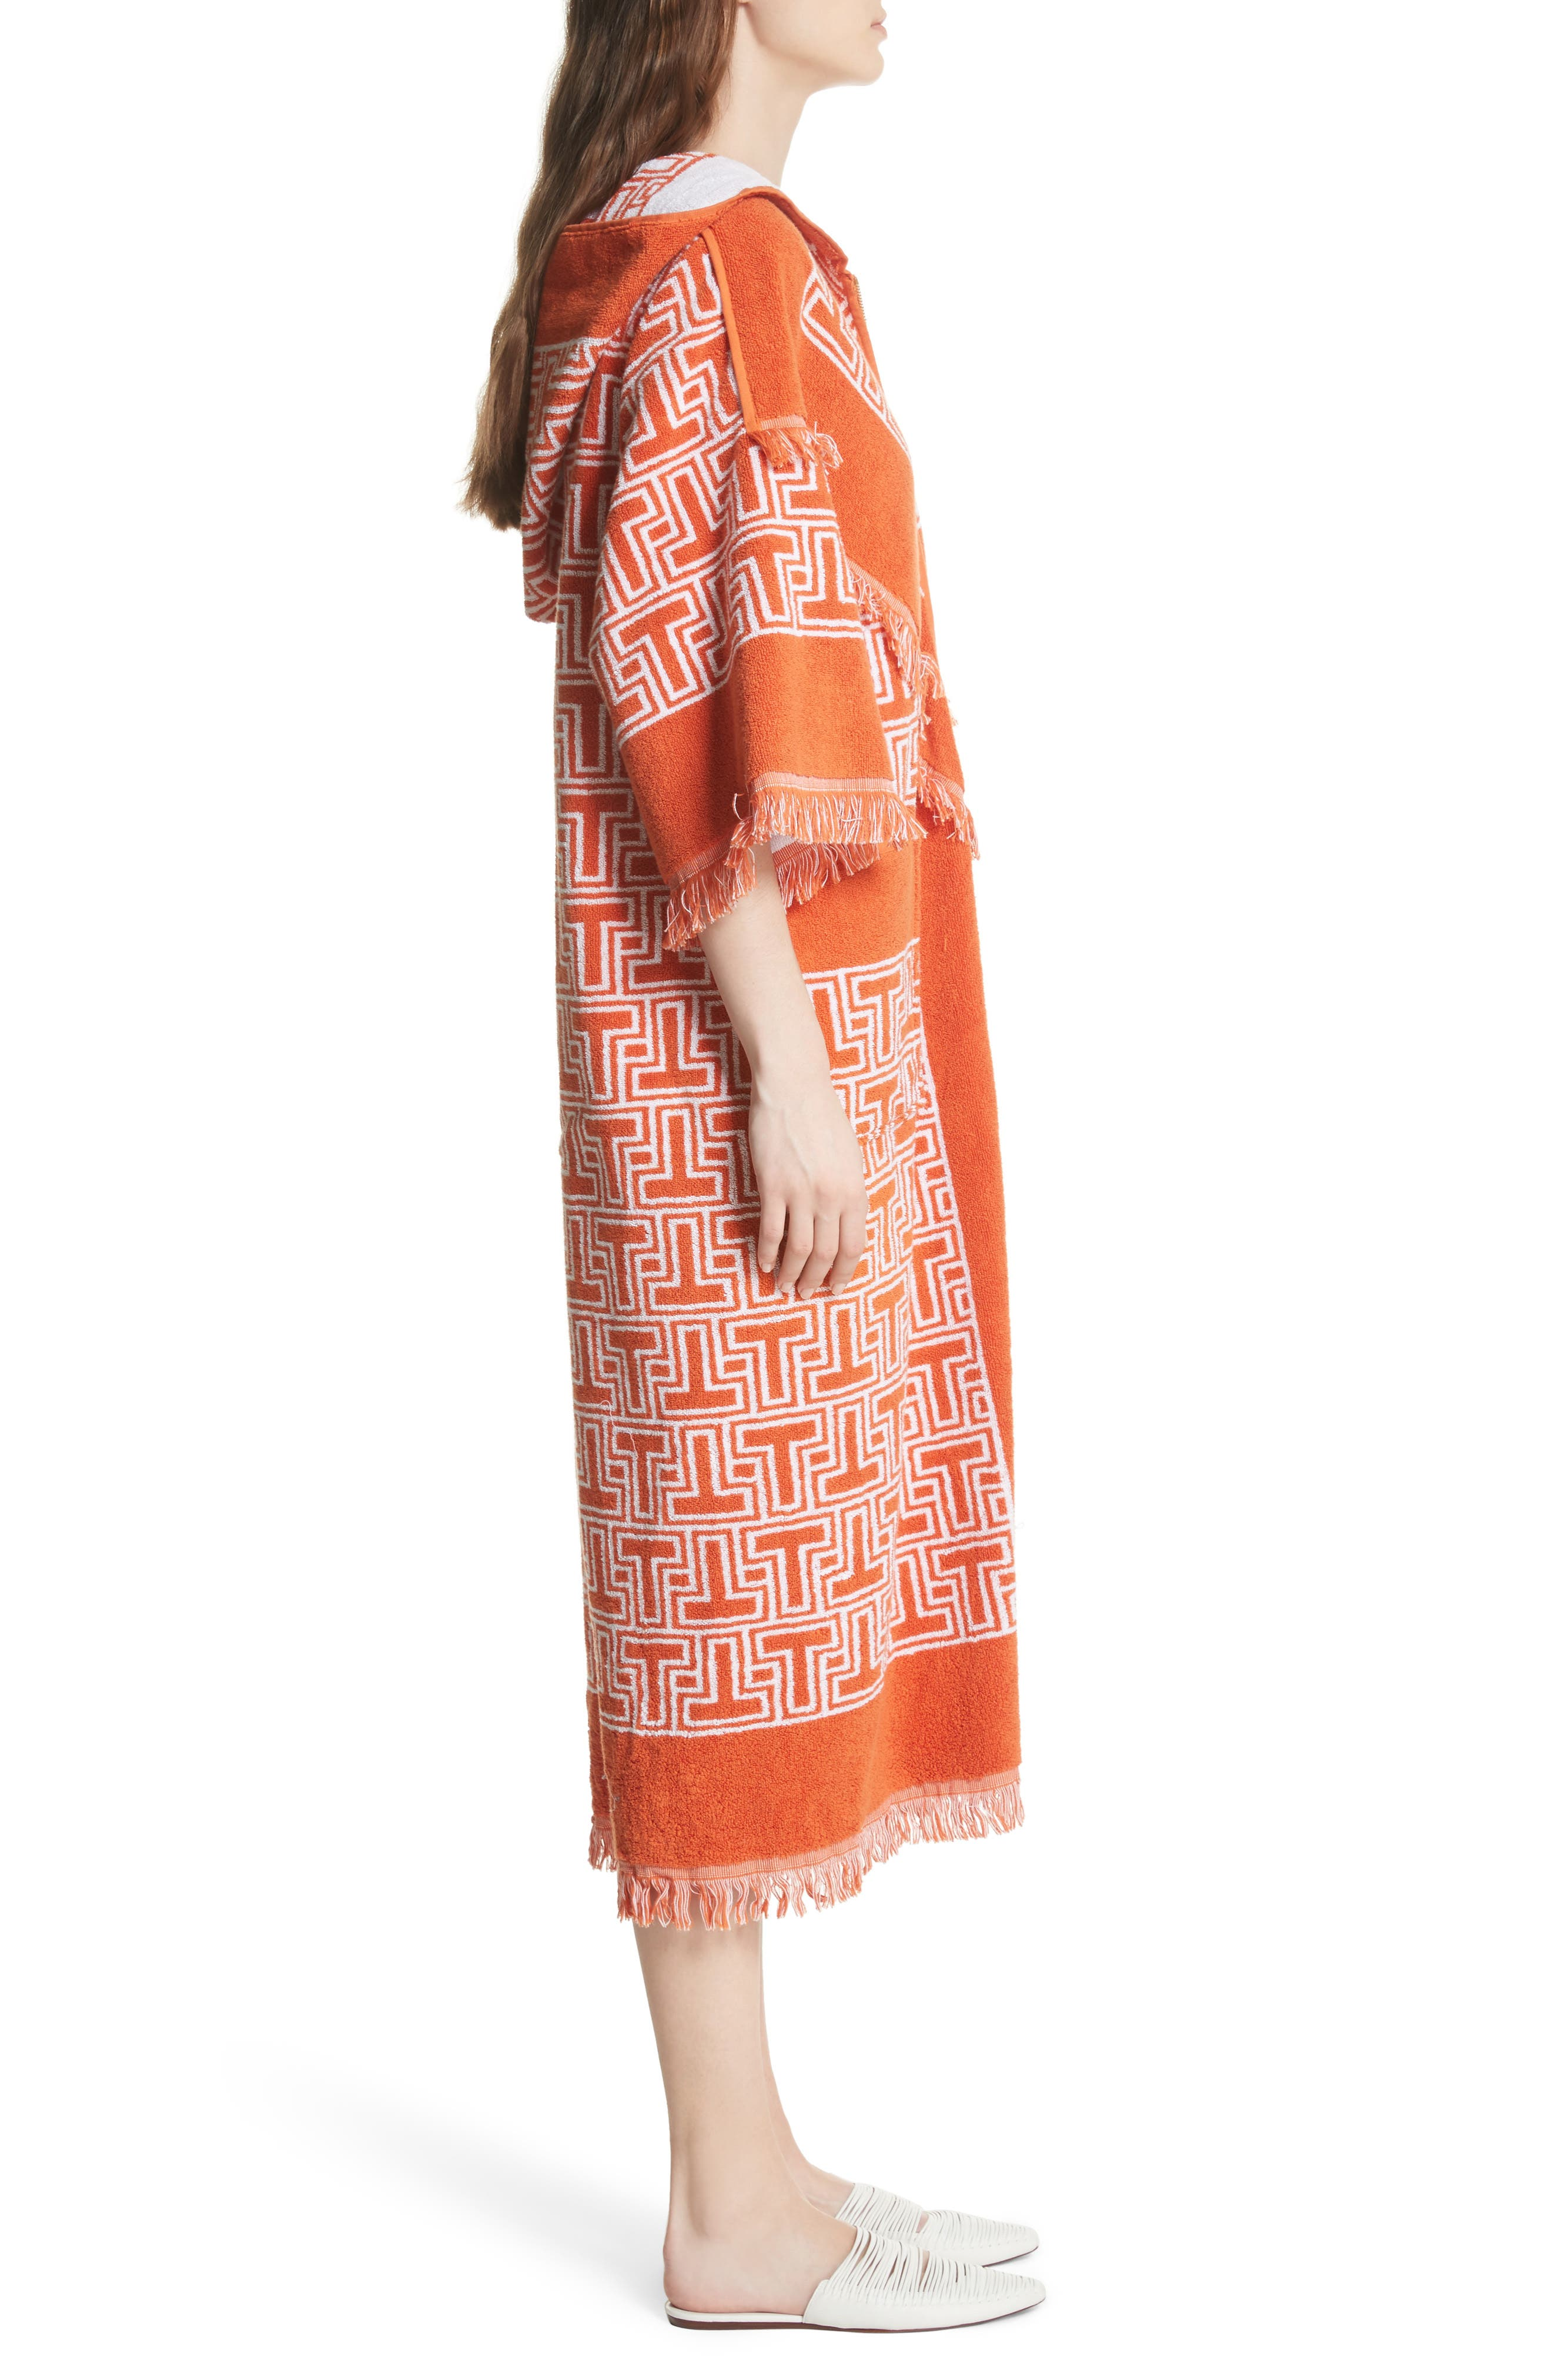 Tile T Terry Coat,                             Alternate thumbnail 3, color,                             Orange Towel Jacquard